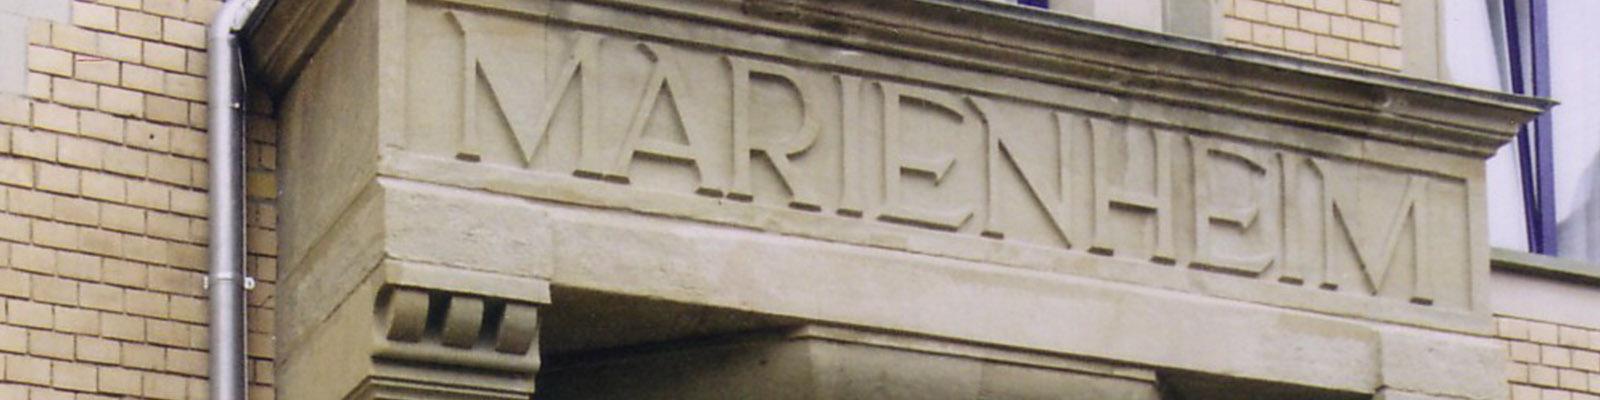 Stiftung Marienheim Stuttgart